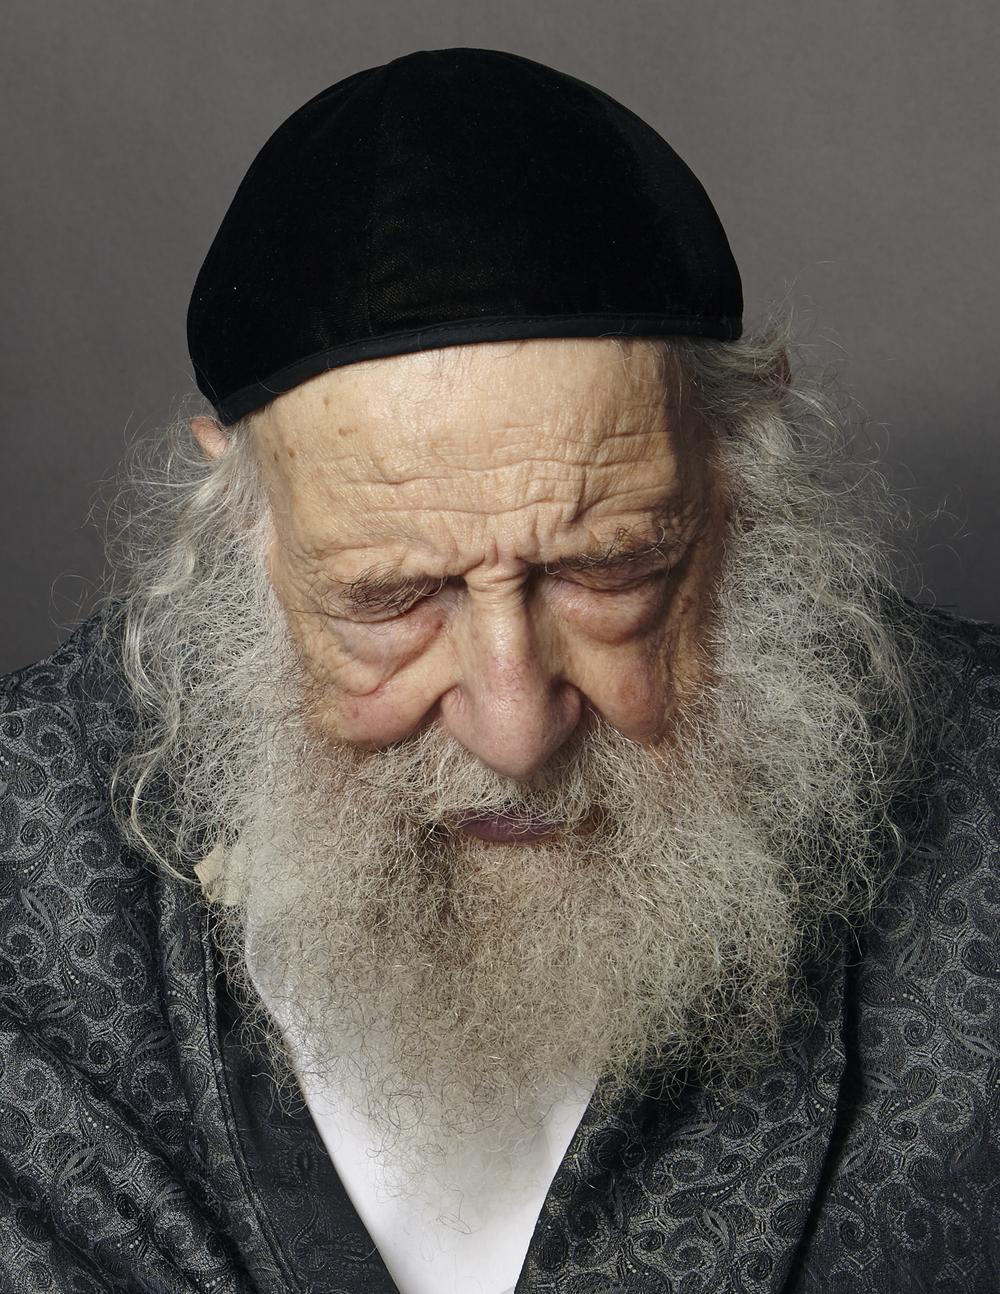 RAV SHNEUR ZALMAN YUDKIN